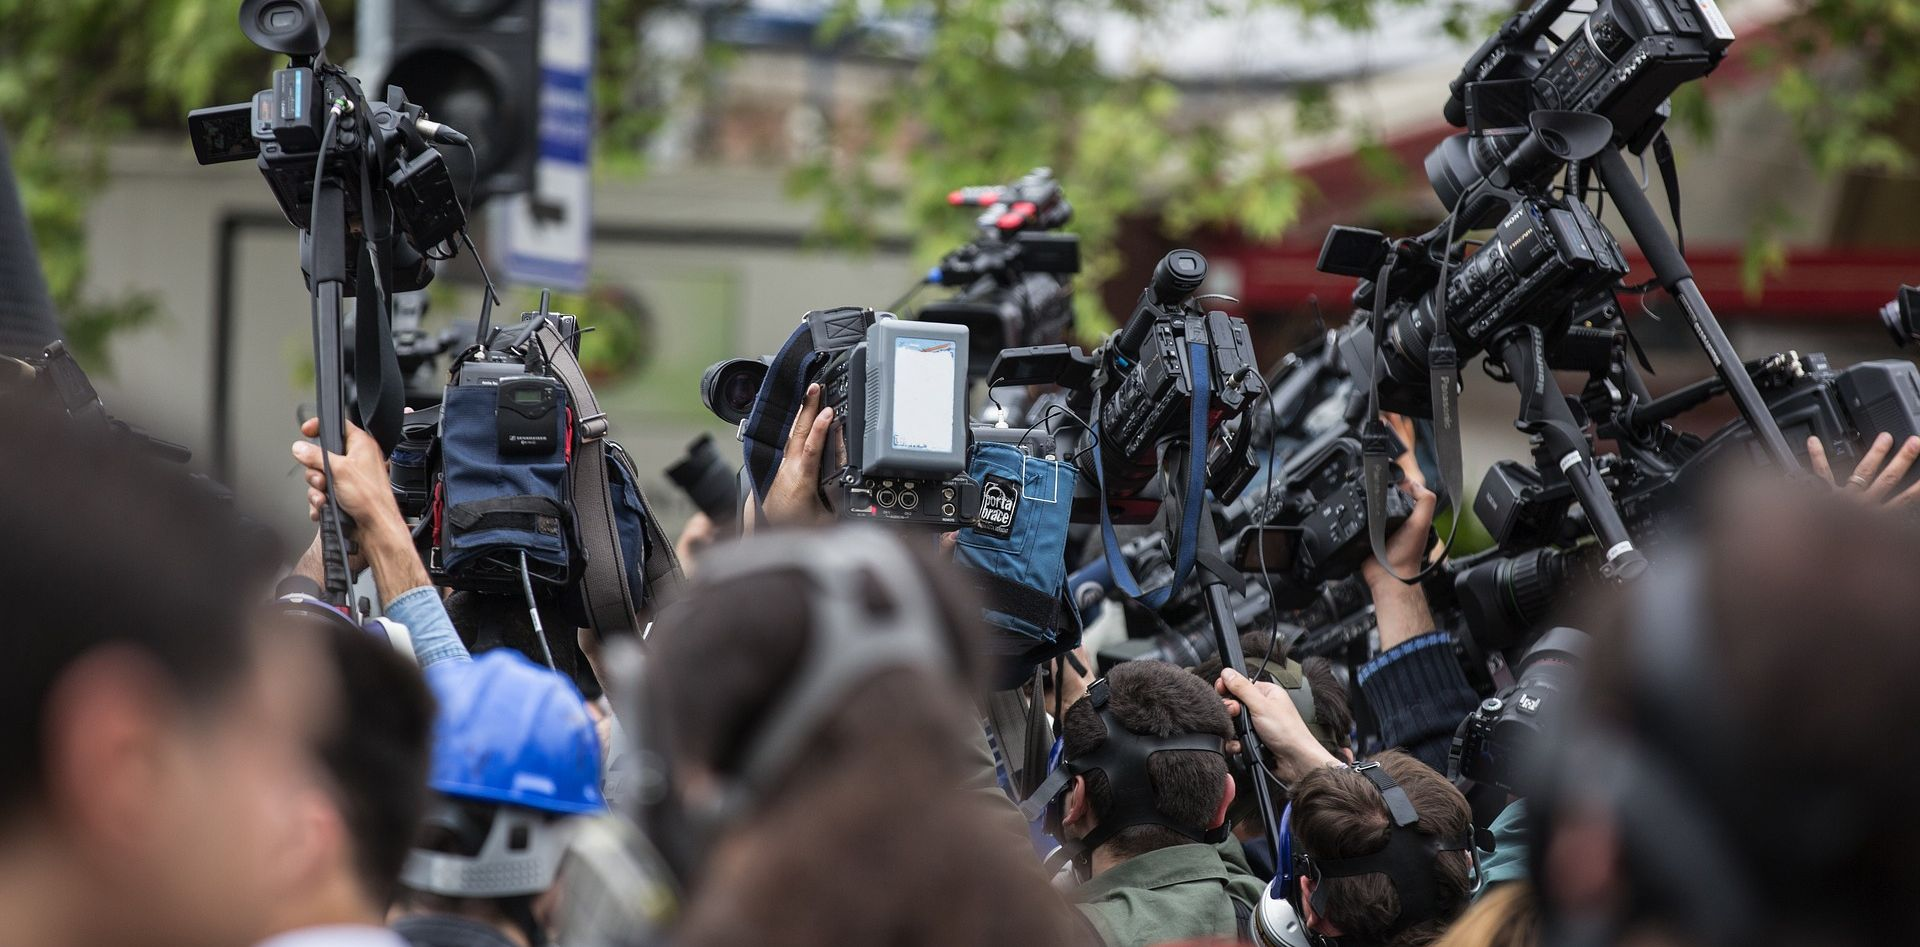 TIMMERMANS VS. PLENKOVIĆ Evo kako o medijima govori potpredsjednik EK, a kako naš premijer